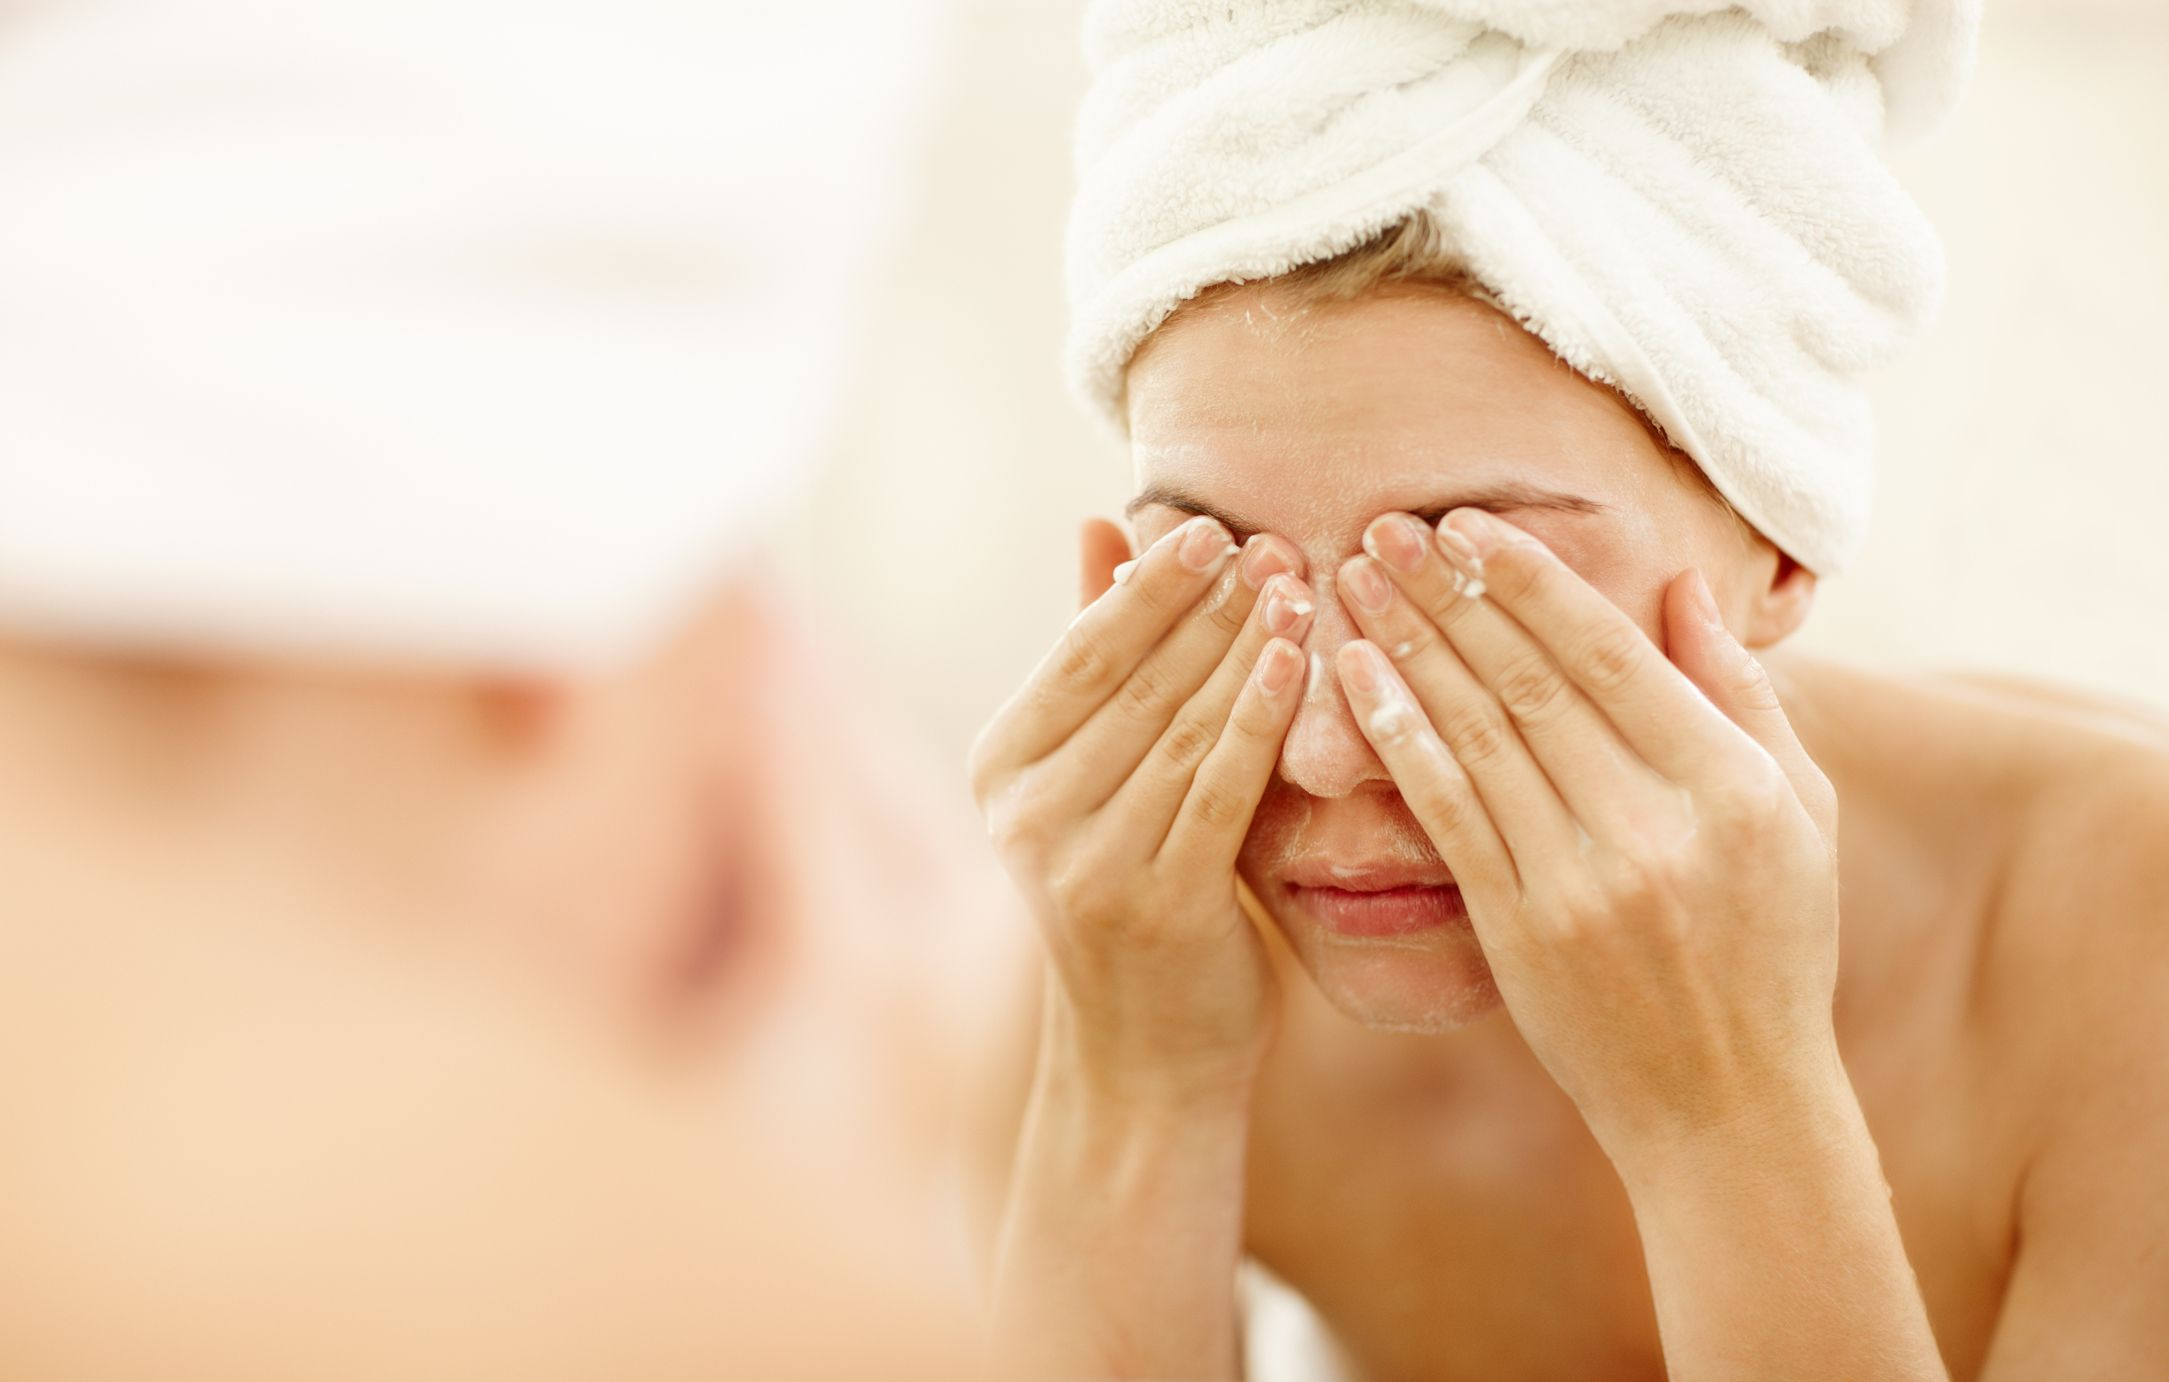 Limpiar la cara